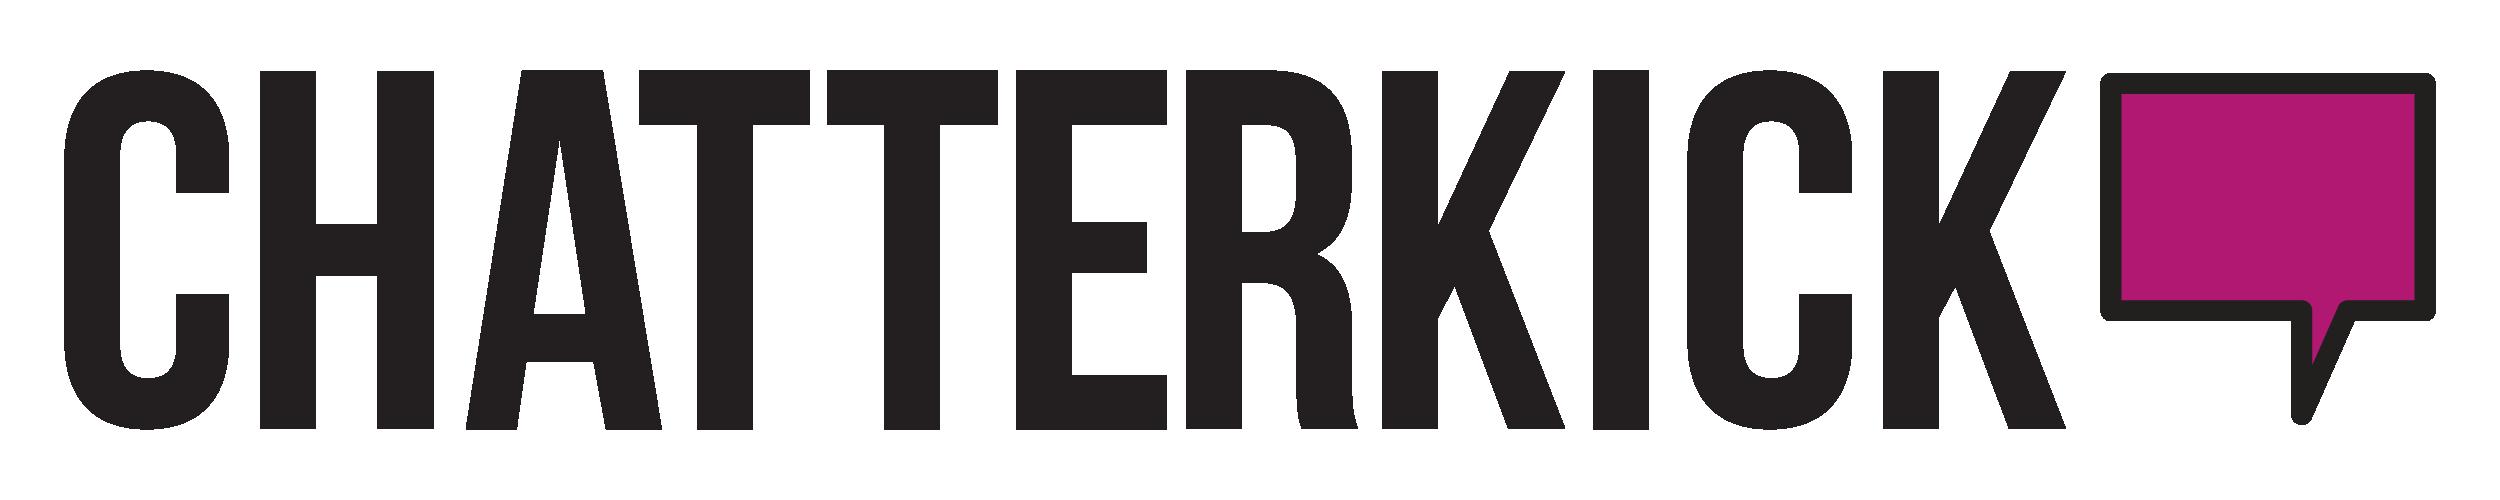 CHATTERKICK HORIZONTAL 2019 BLACKPINK